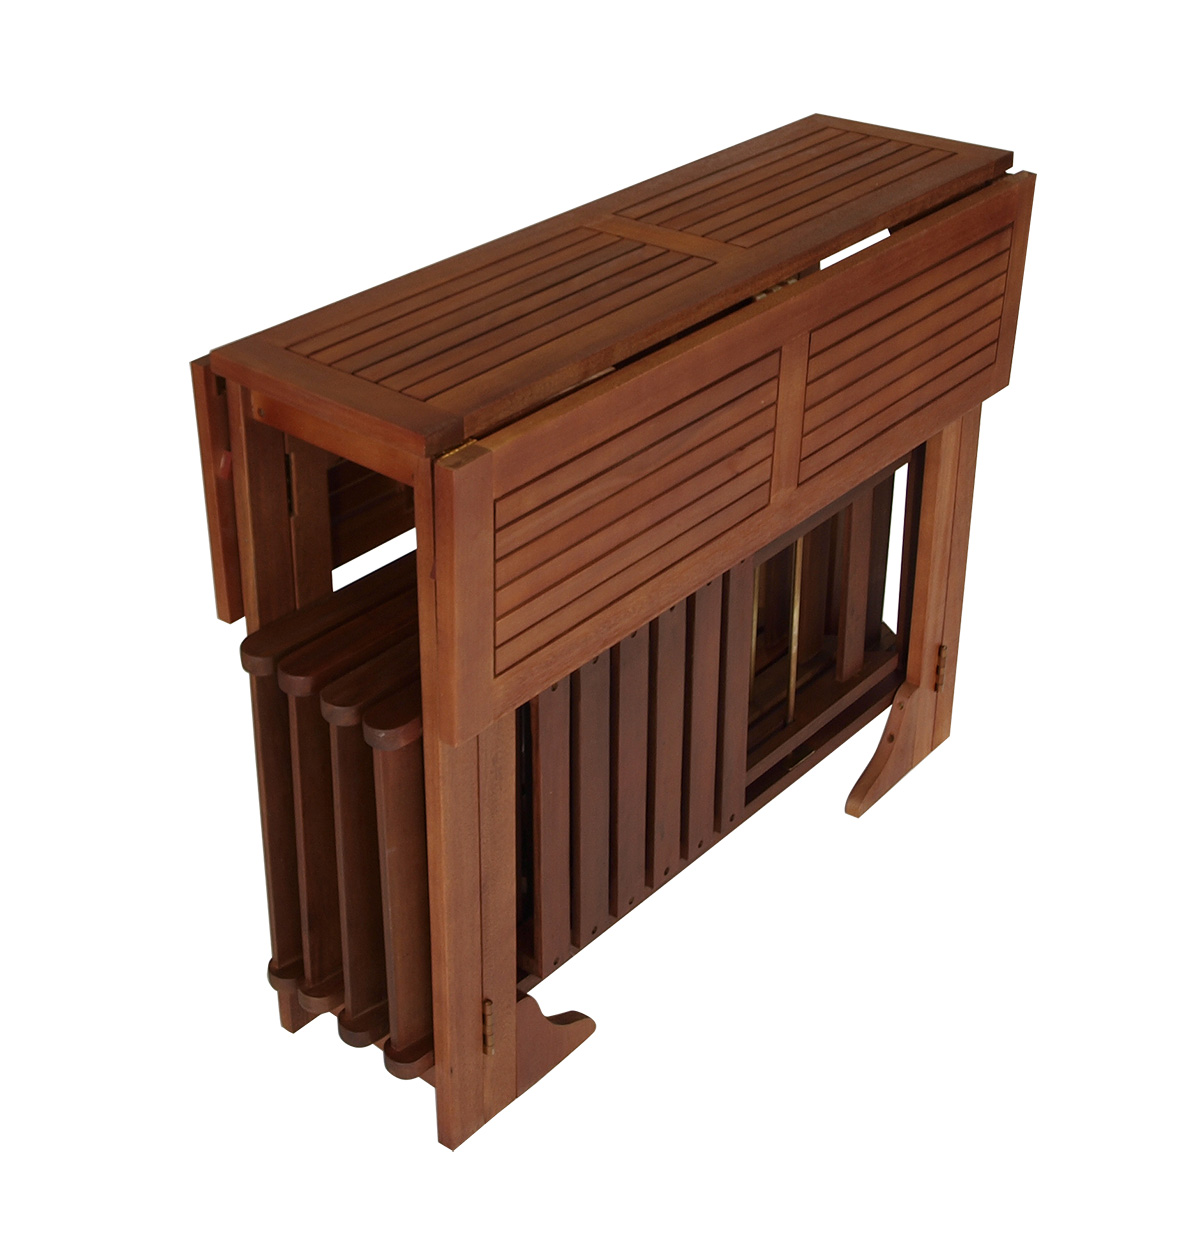 terrassenset balkonset pedro 4x klappstuhl 1x doppelklappentisch fsc ebay. Black Bedroom Furniture Sets. Home Design Ideas